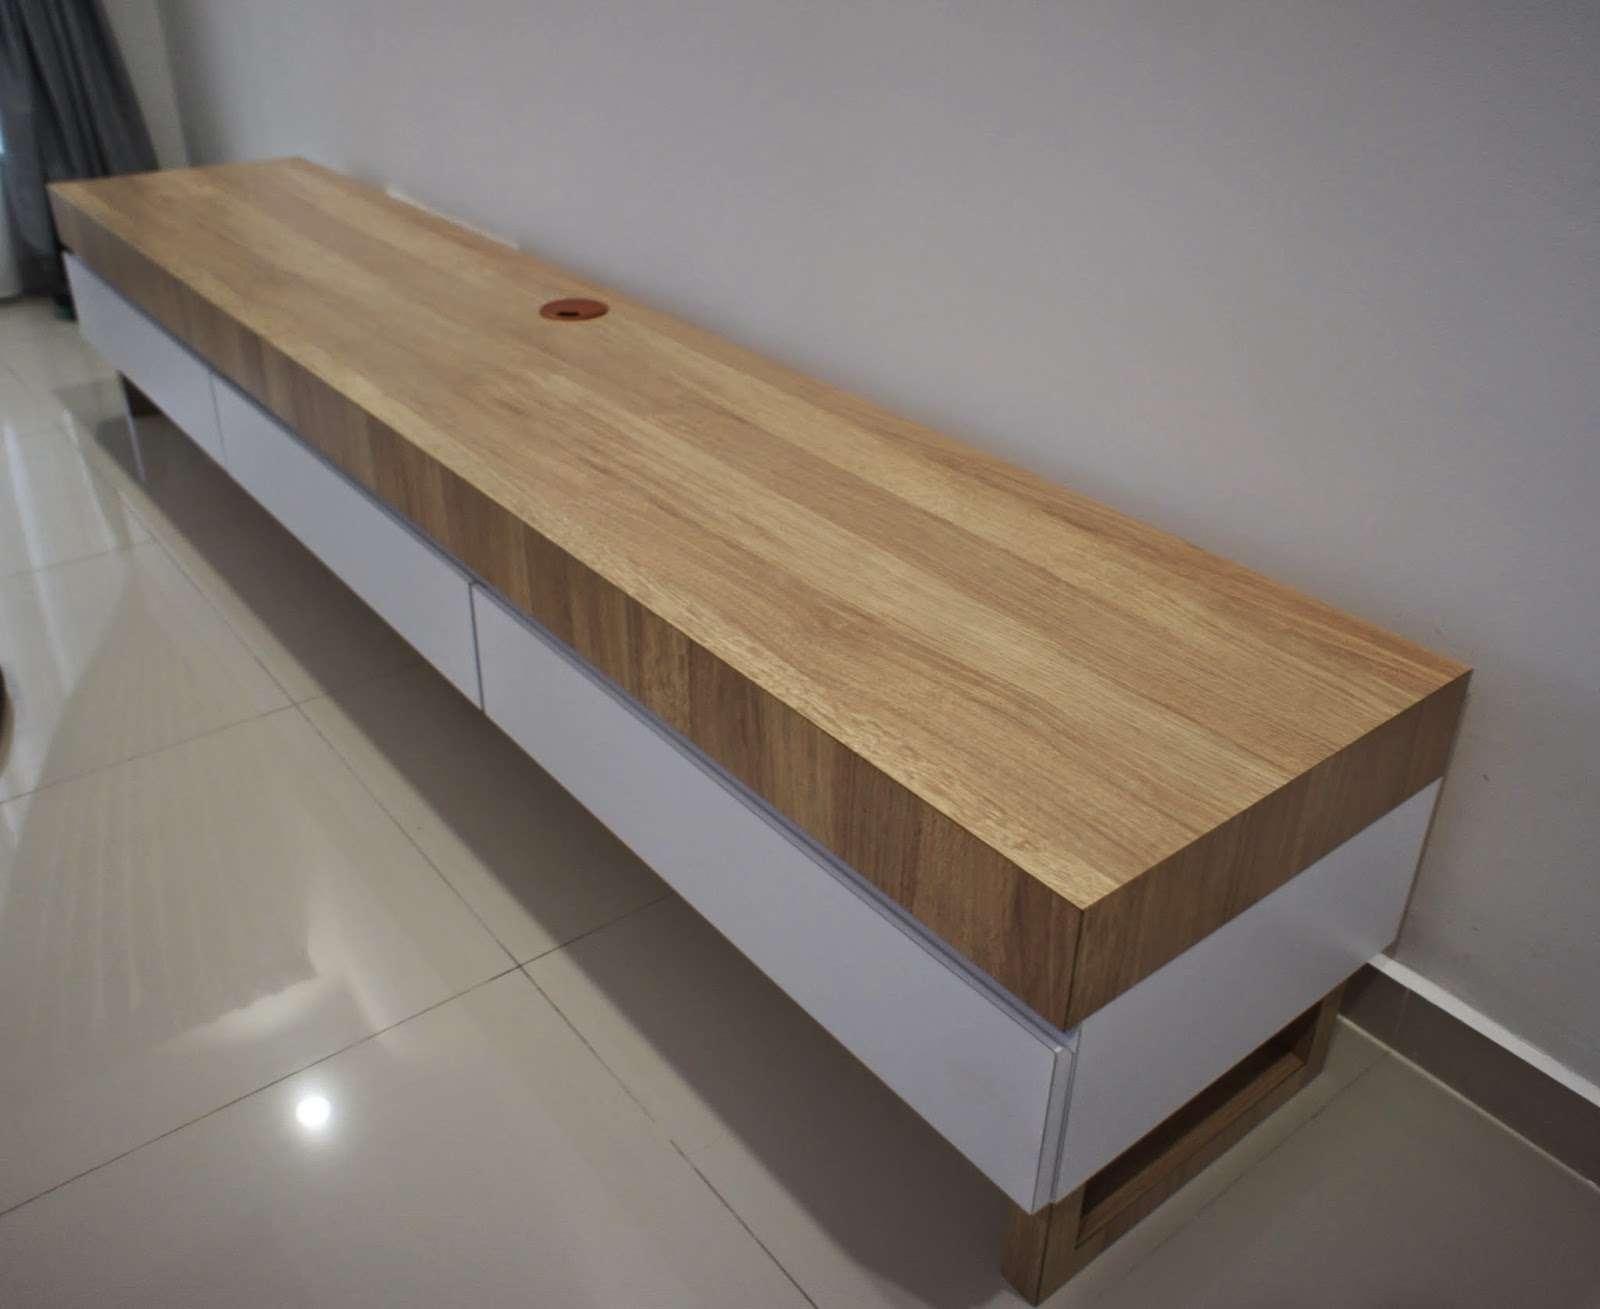 Fukusu: Scandinavian Design Tv Cabinet And Study Table In Awesome For Scandinavian Design Tv Cabinets (View 5 of 20)